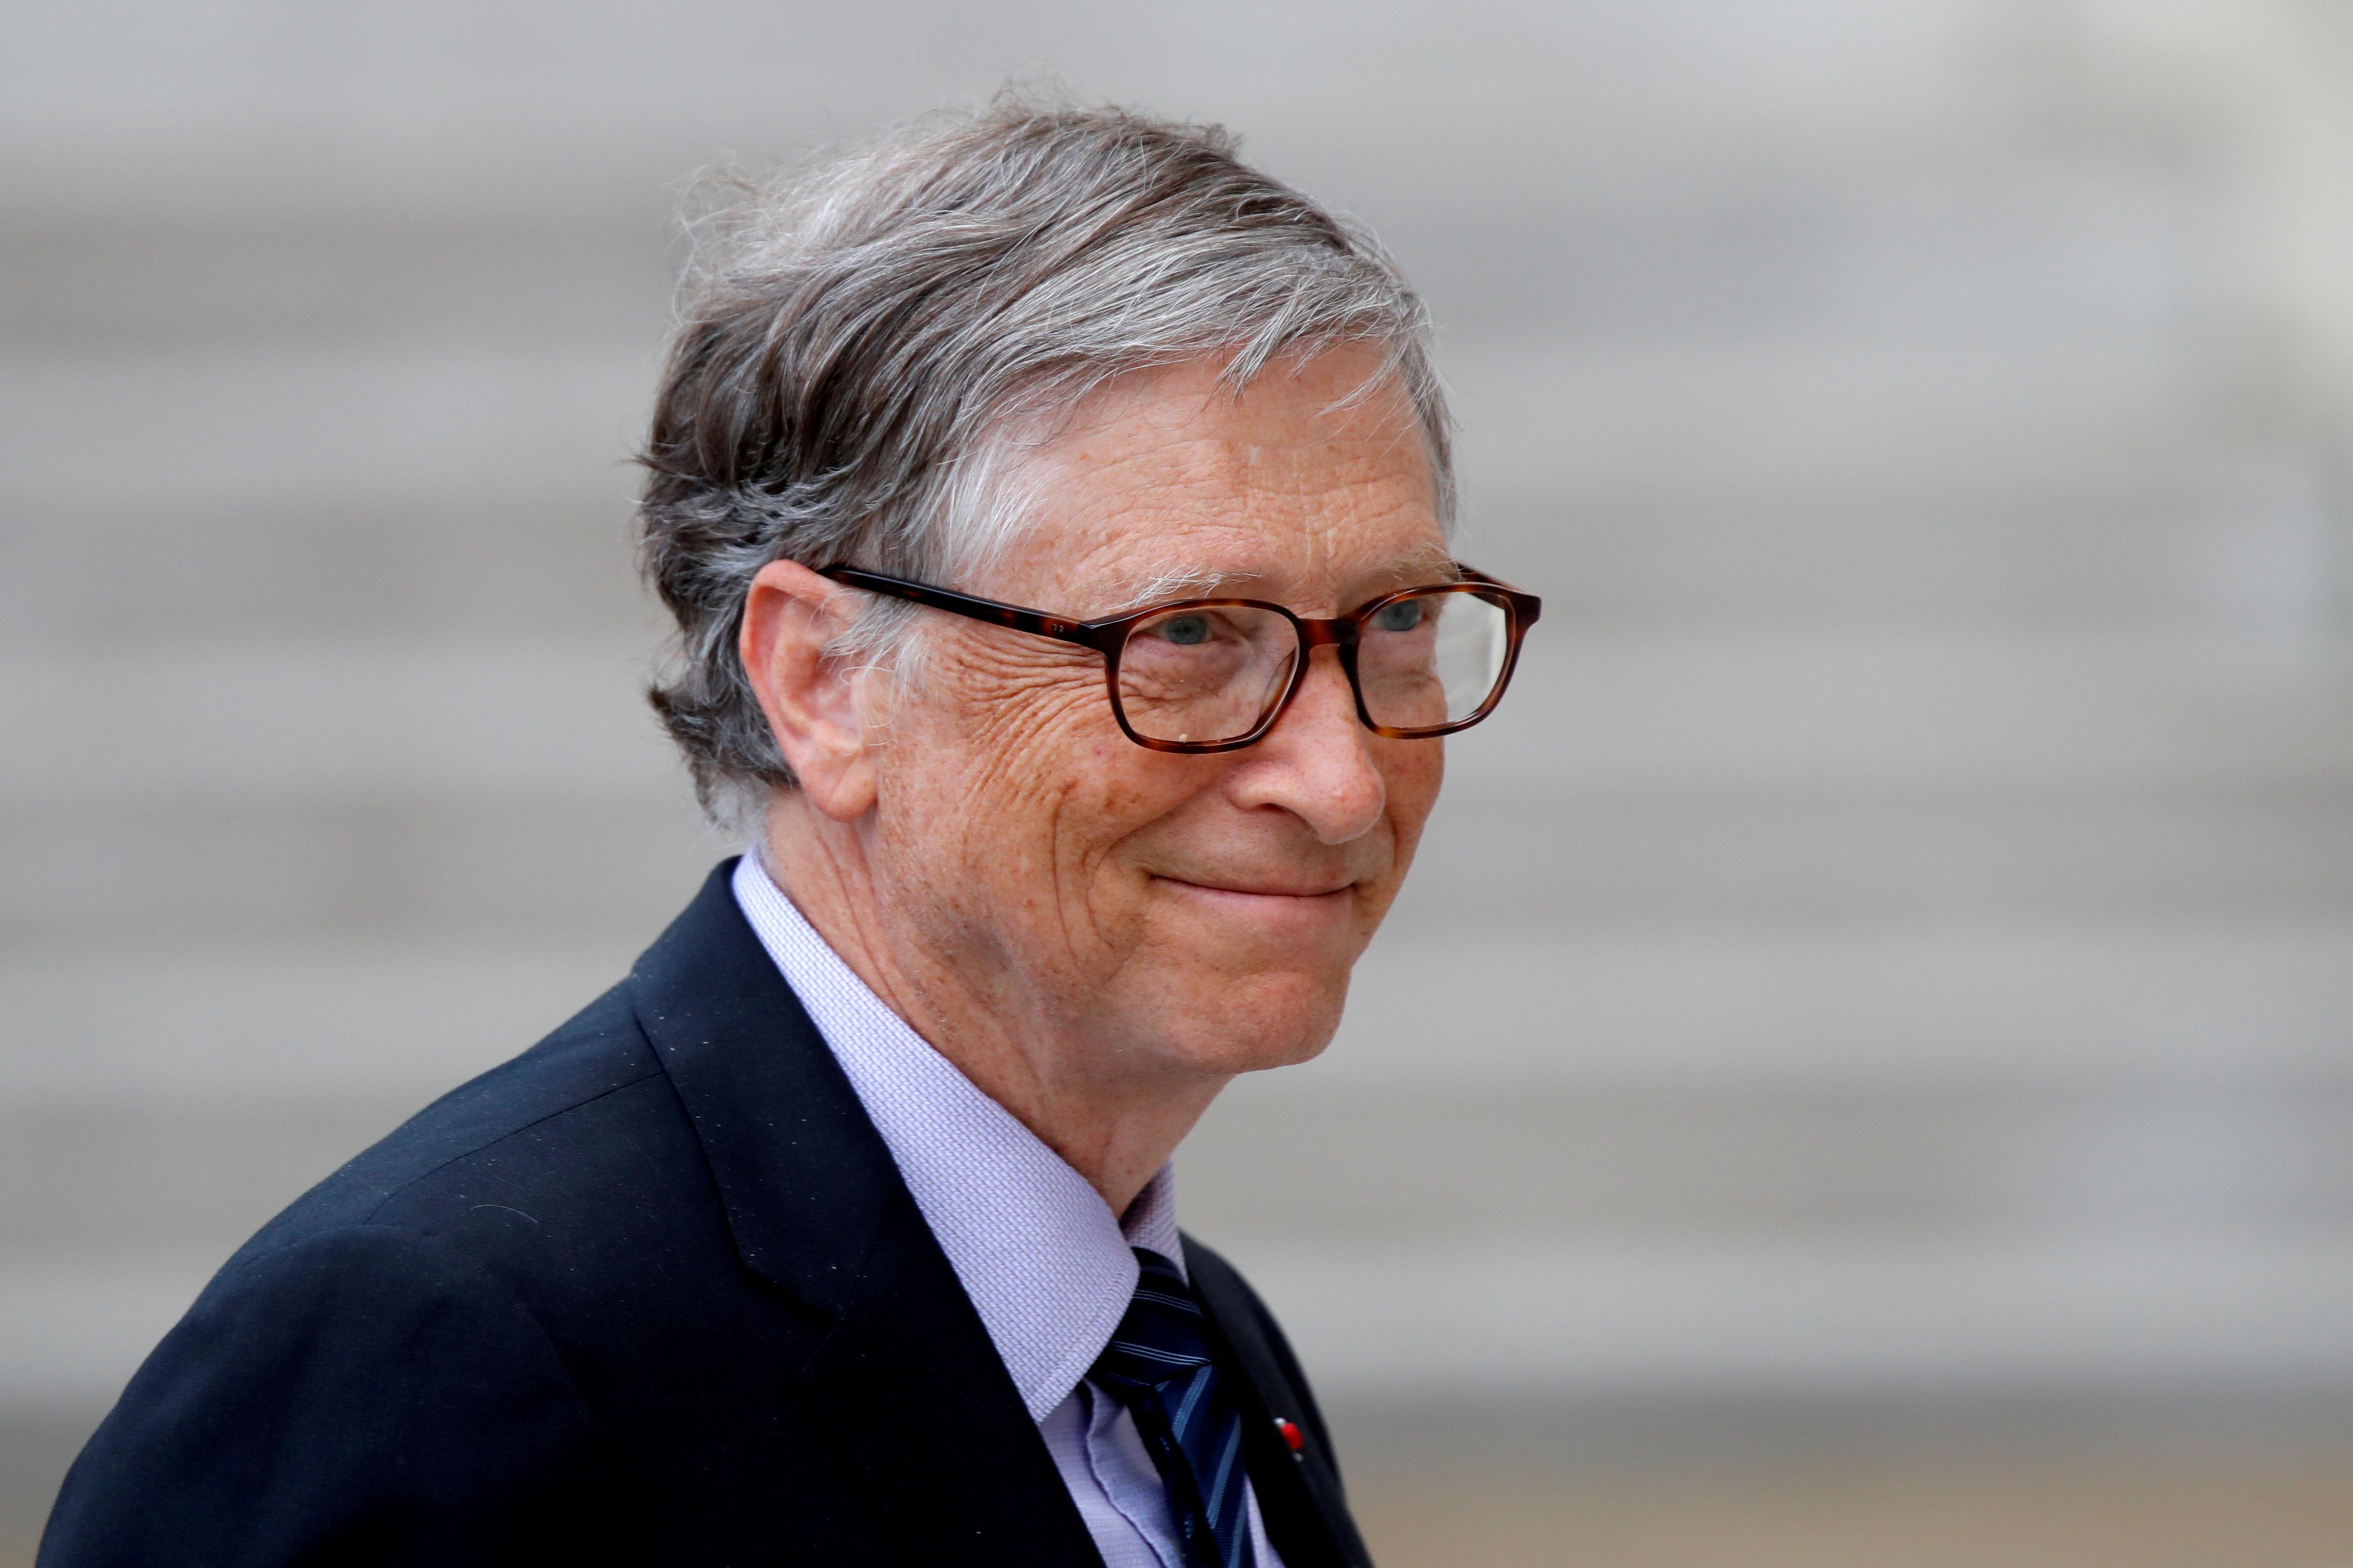 Bill Gates arrives at the Elysee Palace in Paris, France, April 16, 2018. REUTERS/Charles Platiau